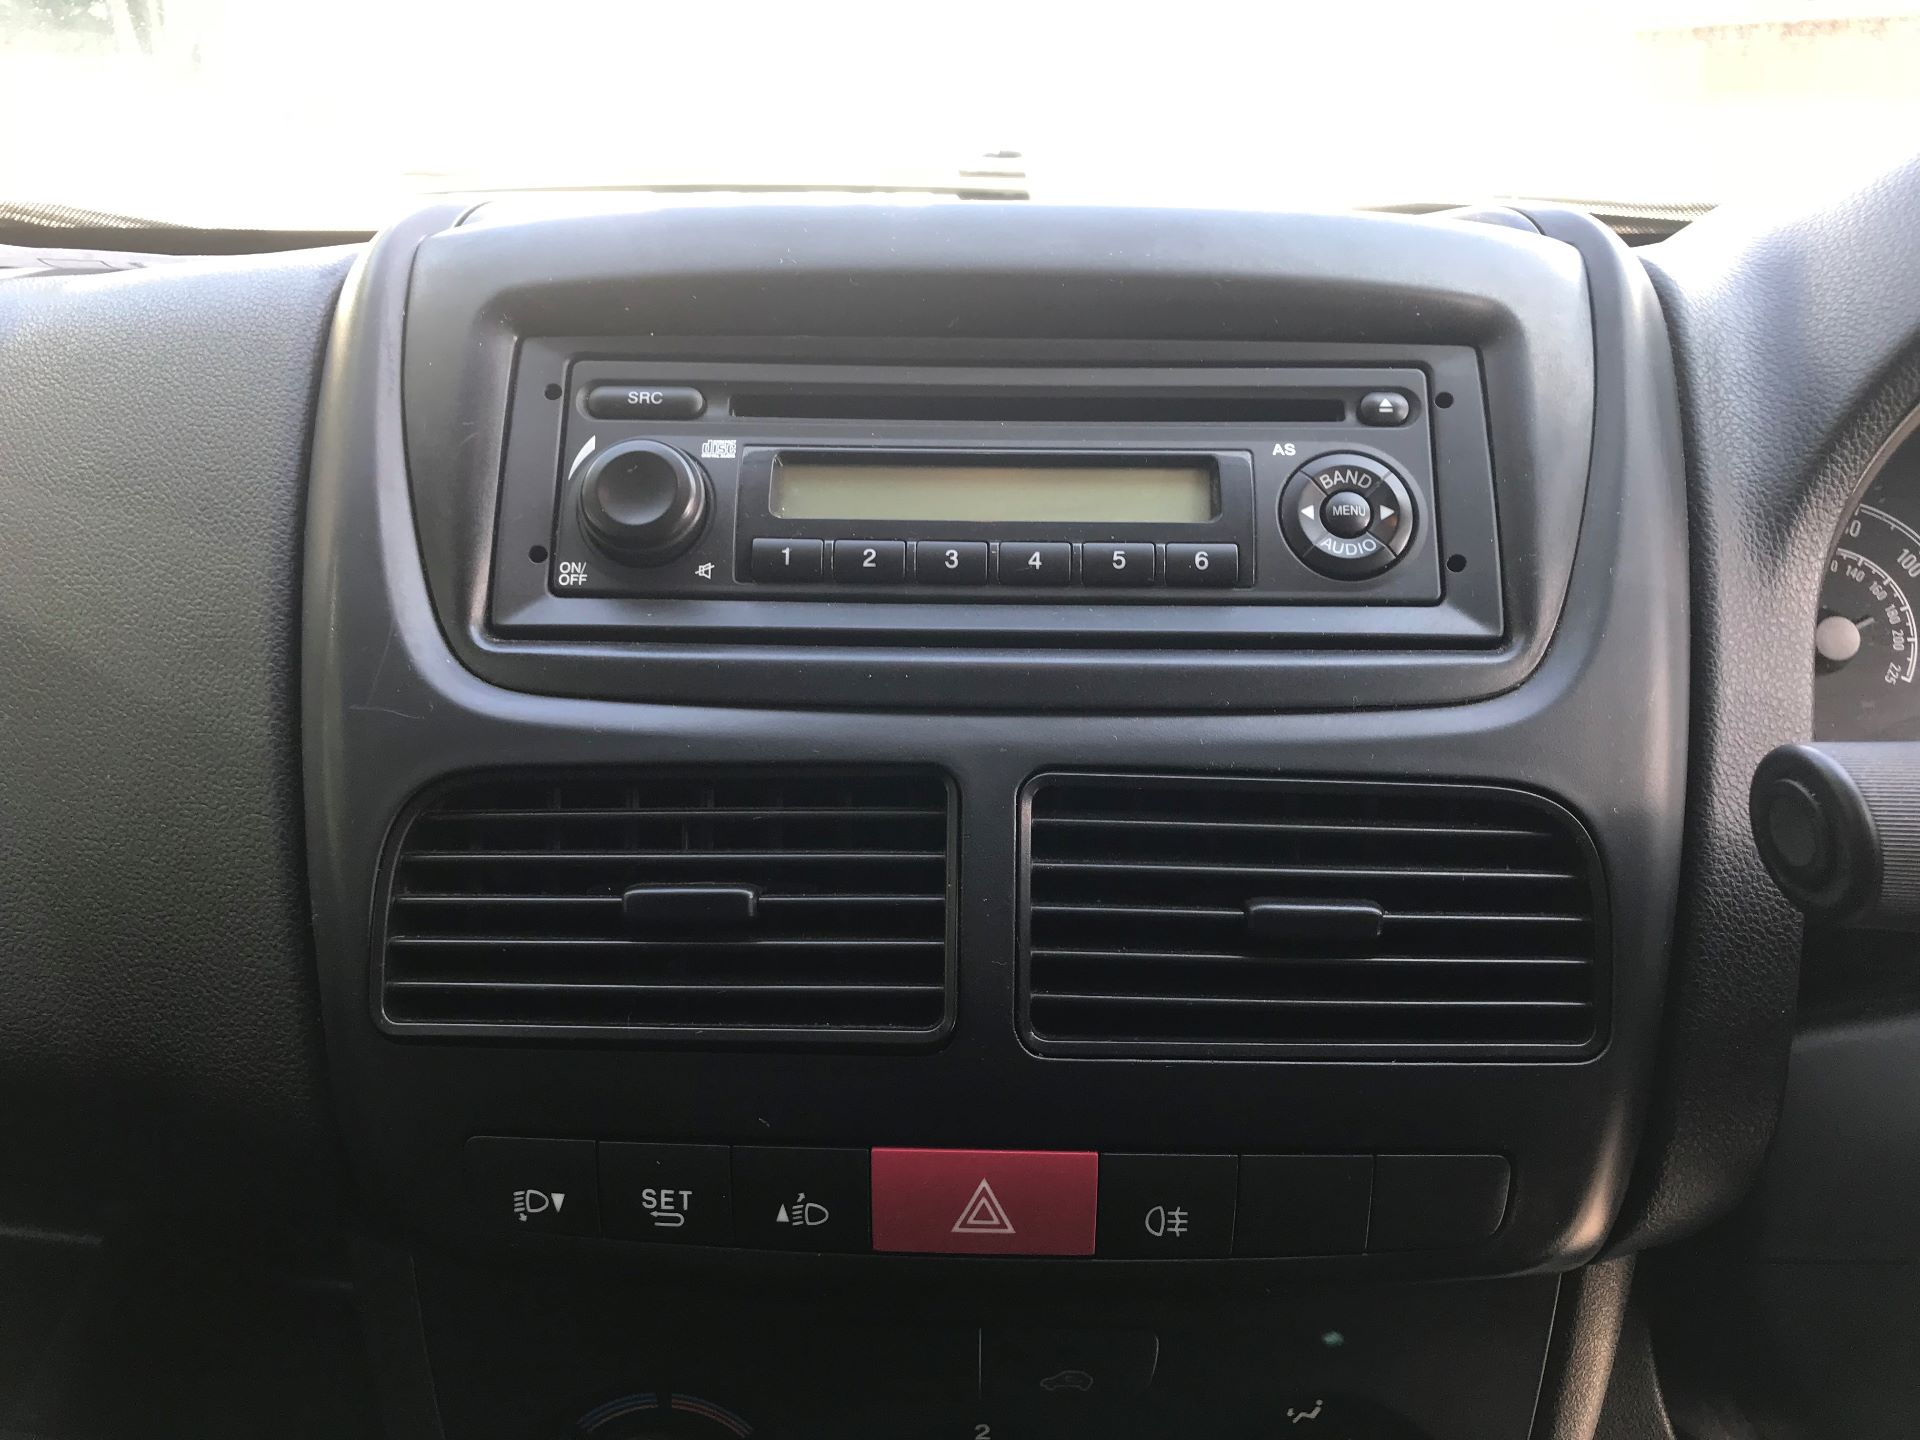 2014 Vauxhall Combo   L1 H1 2000 1.3 16V  EURO 5 (DN64KLK) Image 3